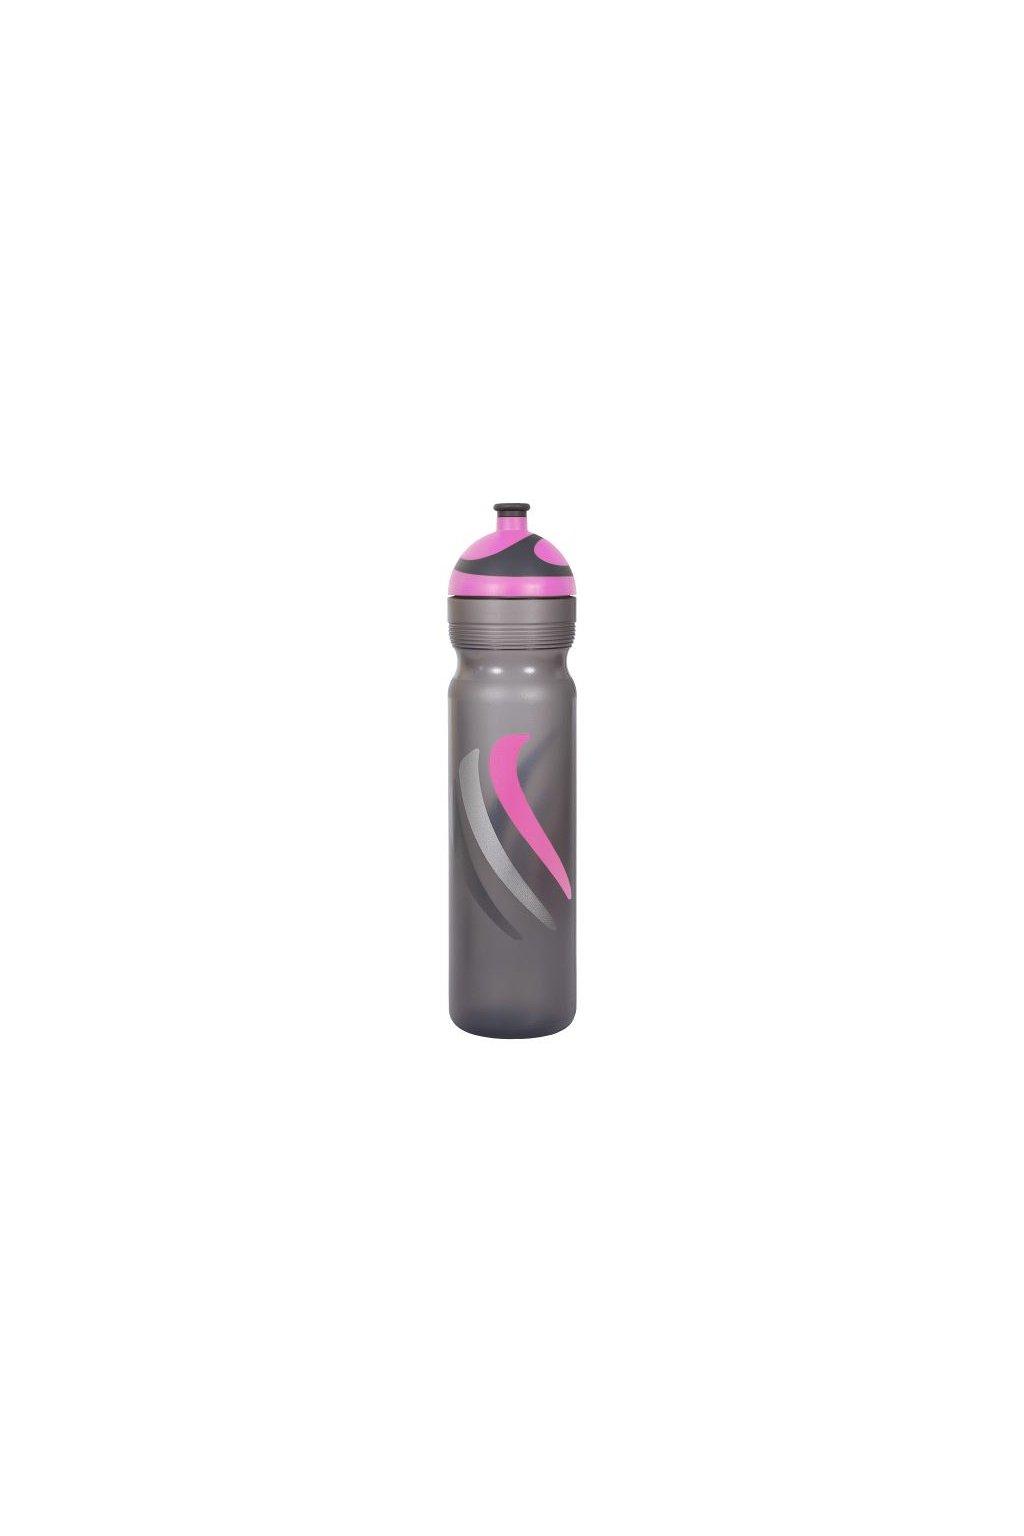 zdrava lahev bike 2k19 ruzova 1 0l